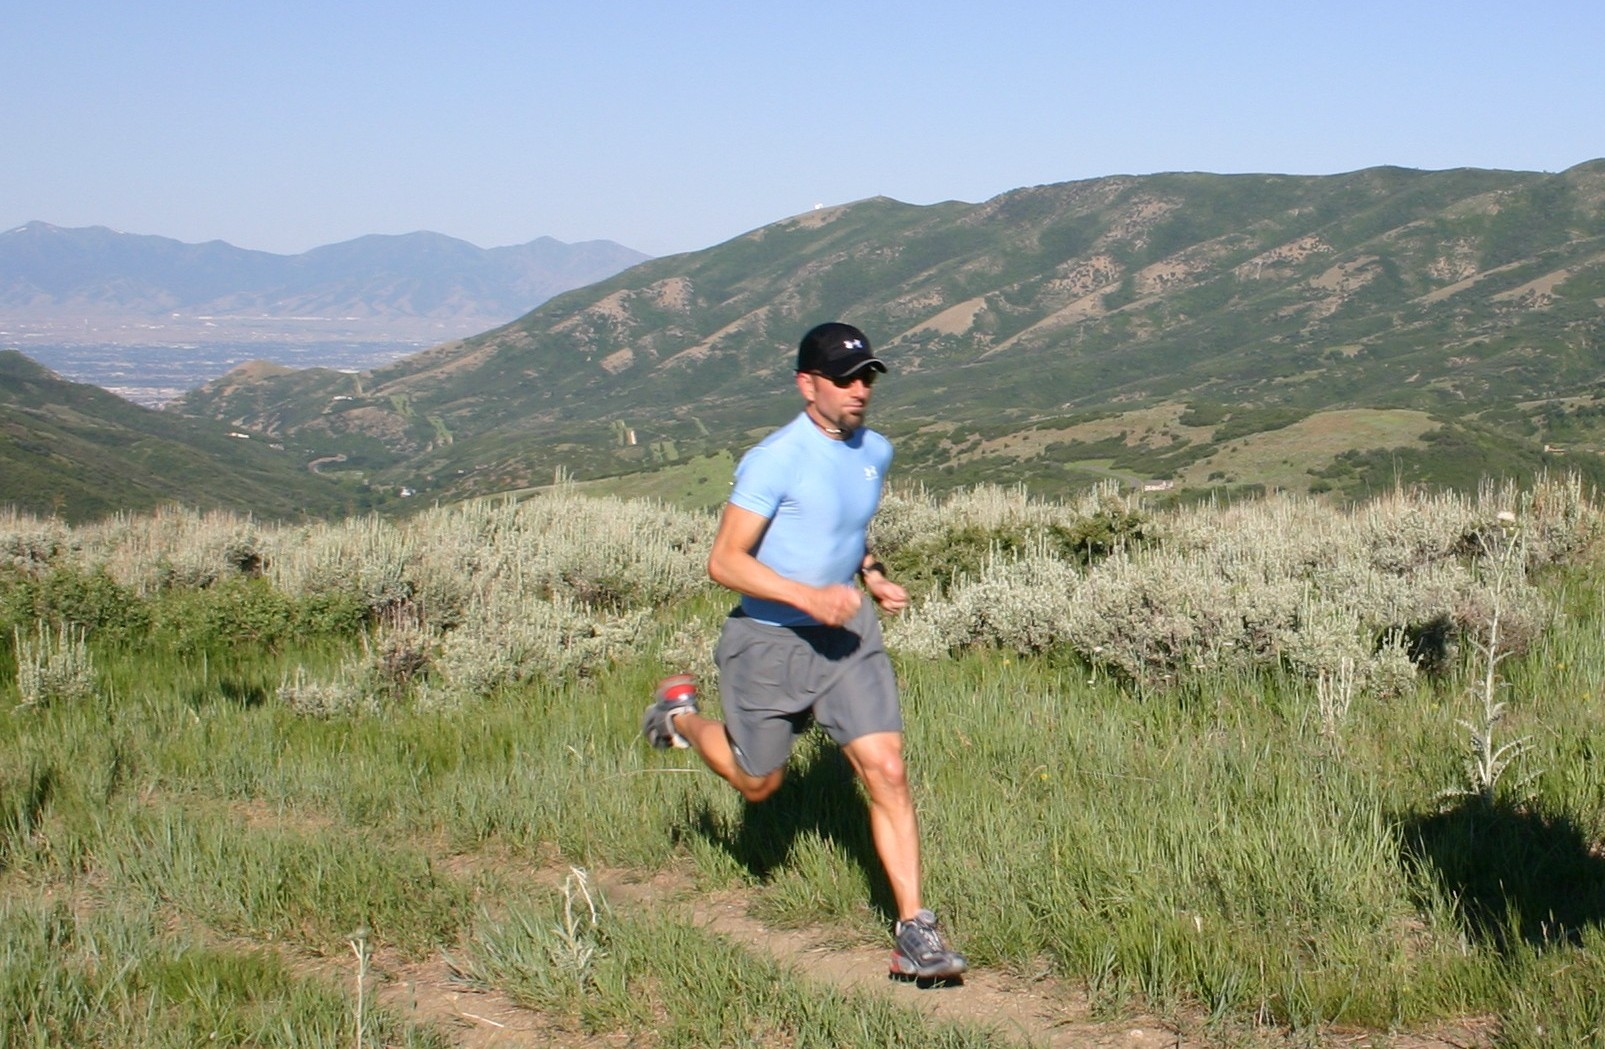 Salomon Trail Running Shoe With Roomy Toe Box